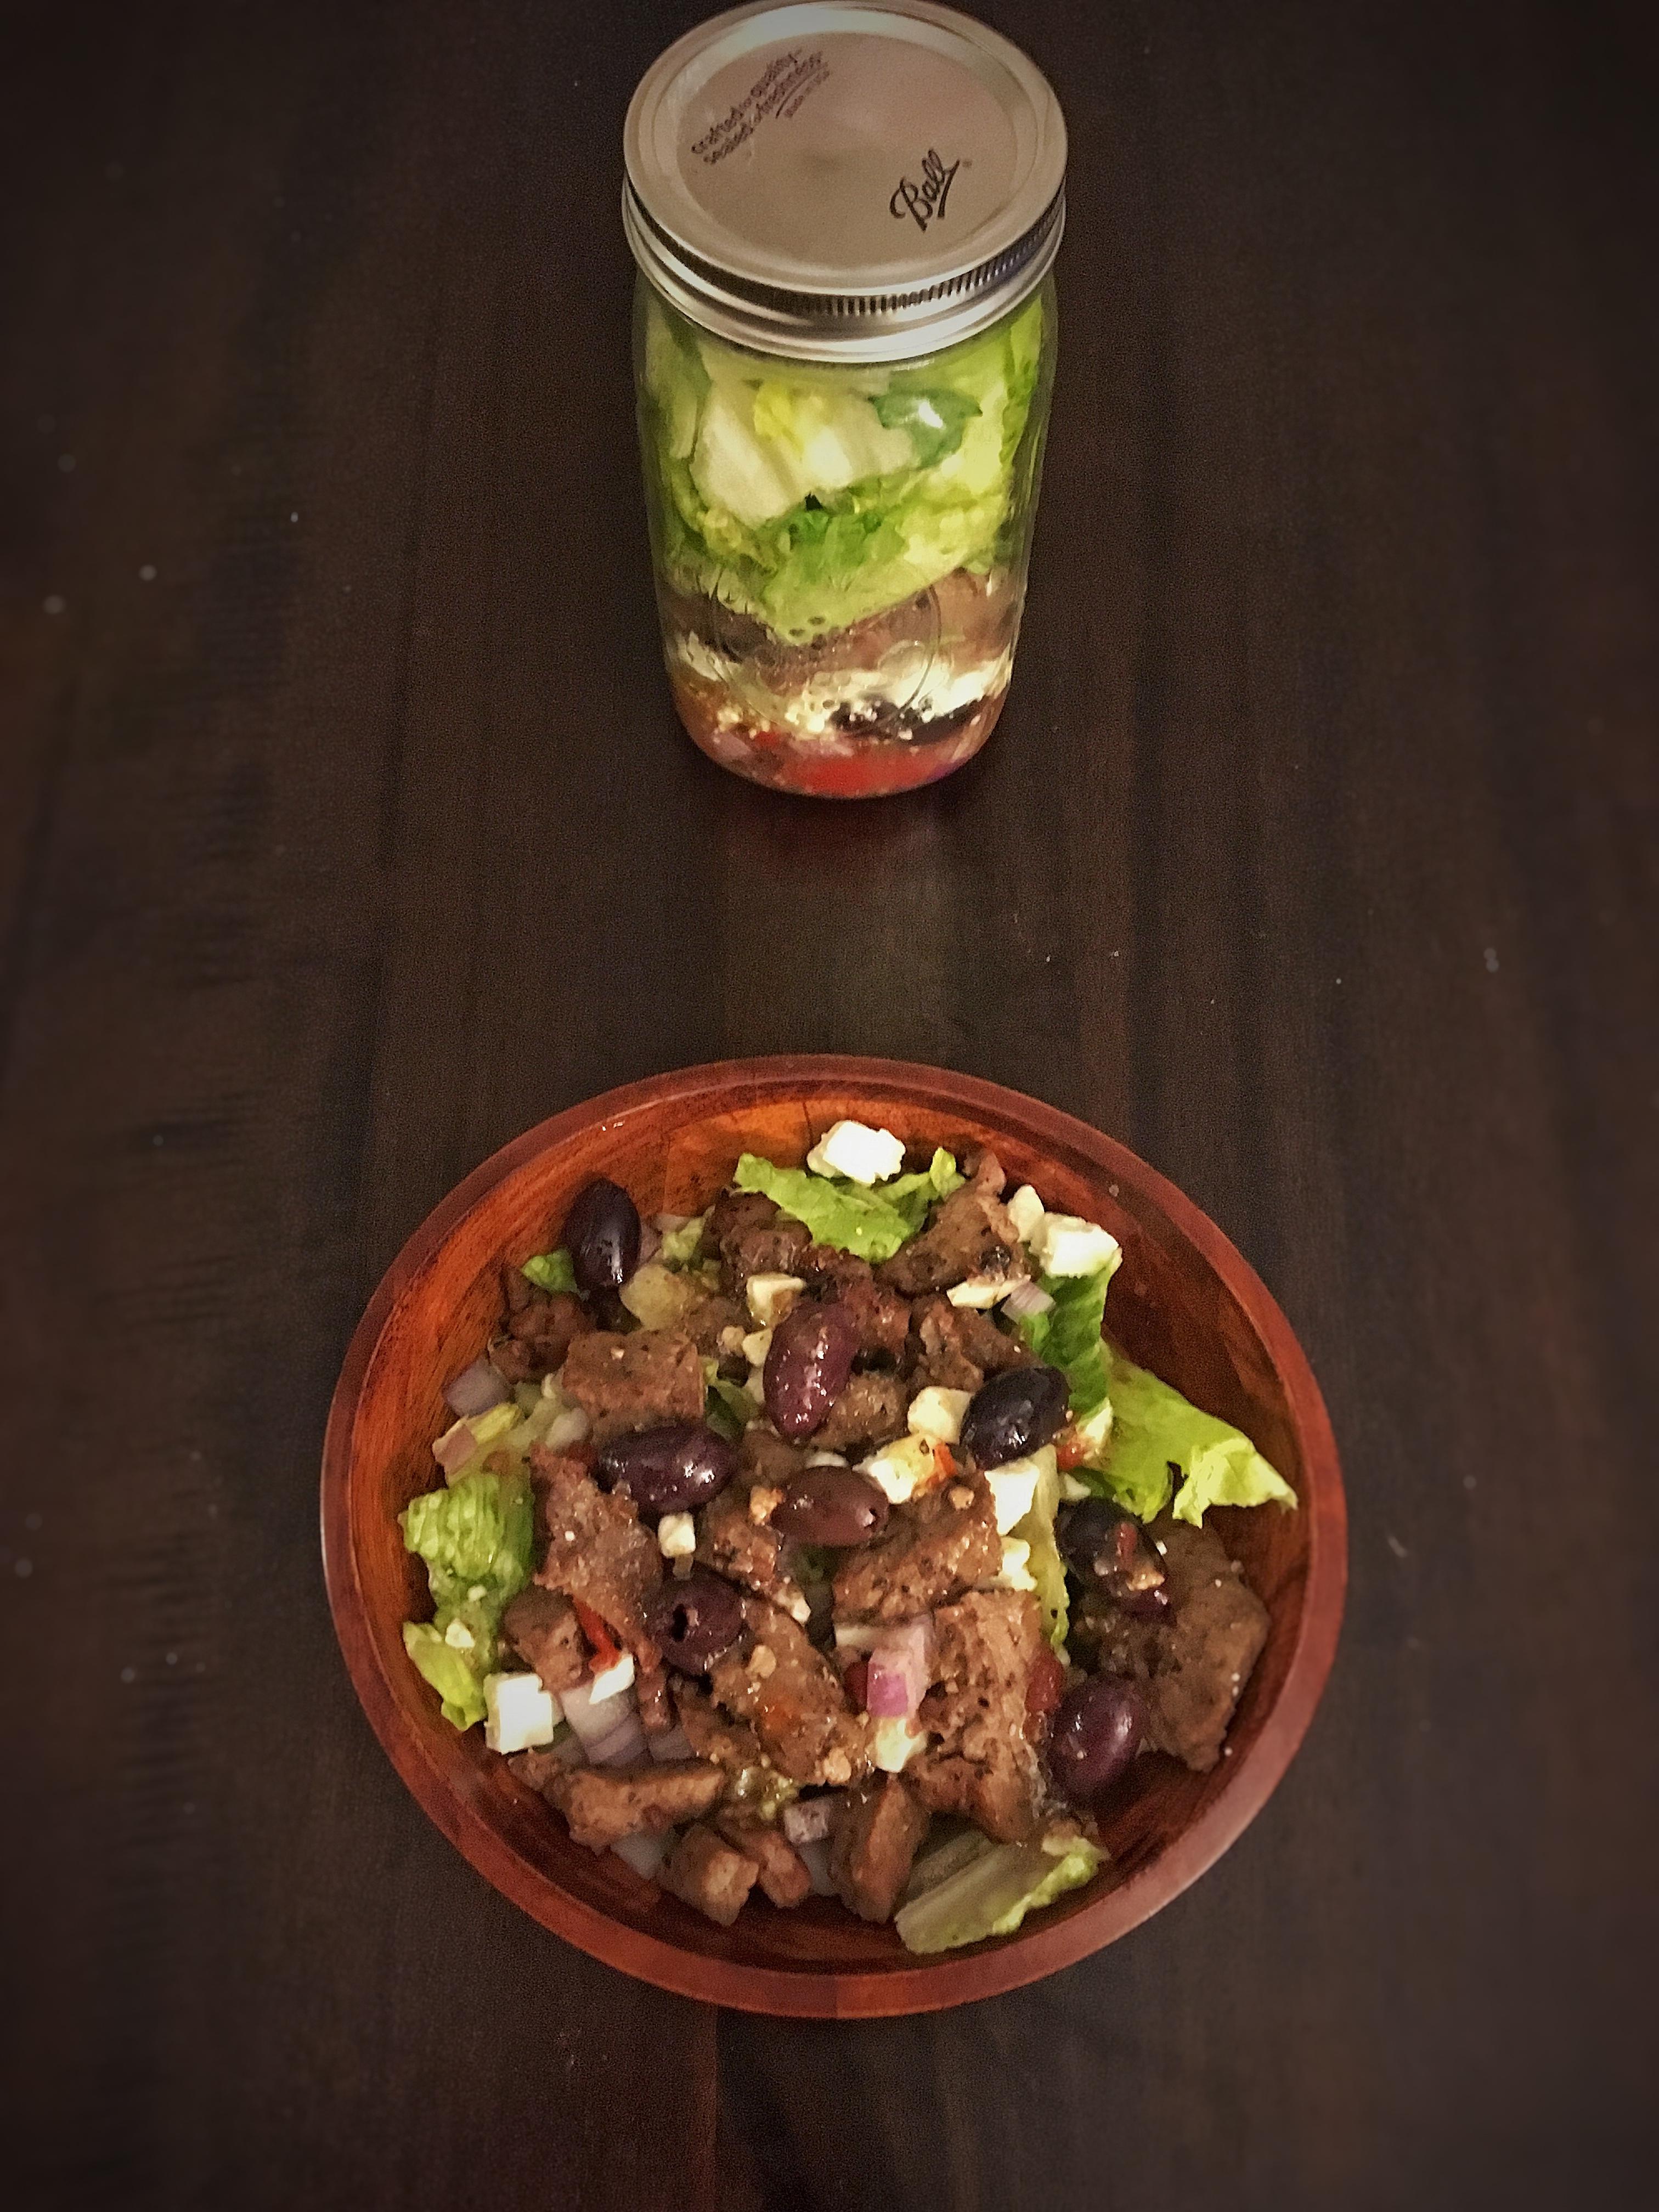 Greek Mason Jar Steak Salad B. Tario